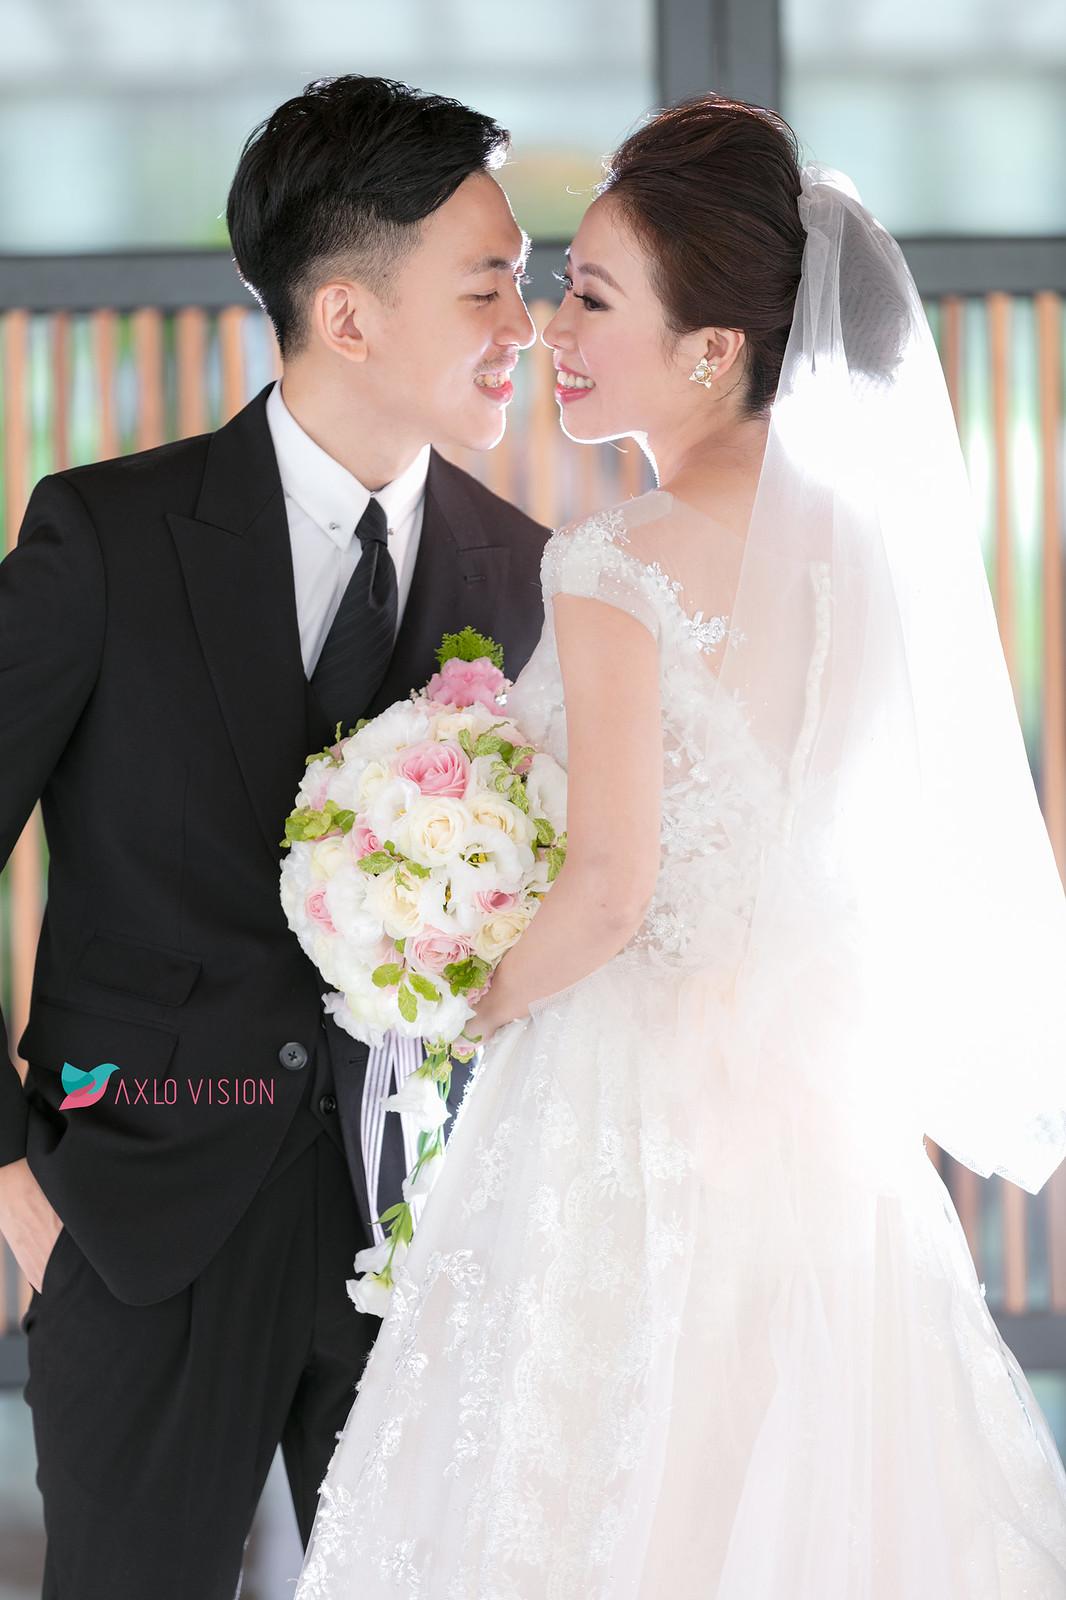 20170916 WeddingDay_085